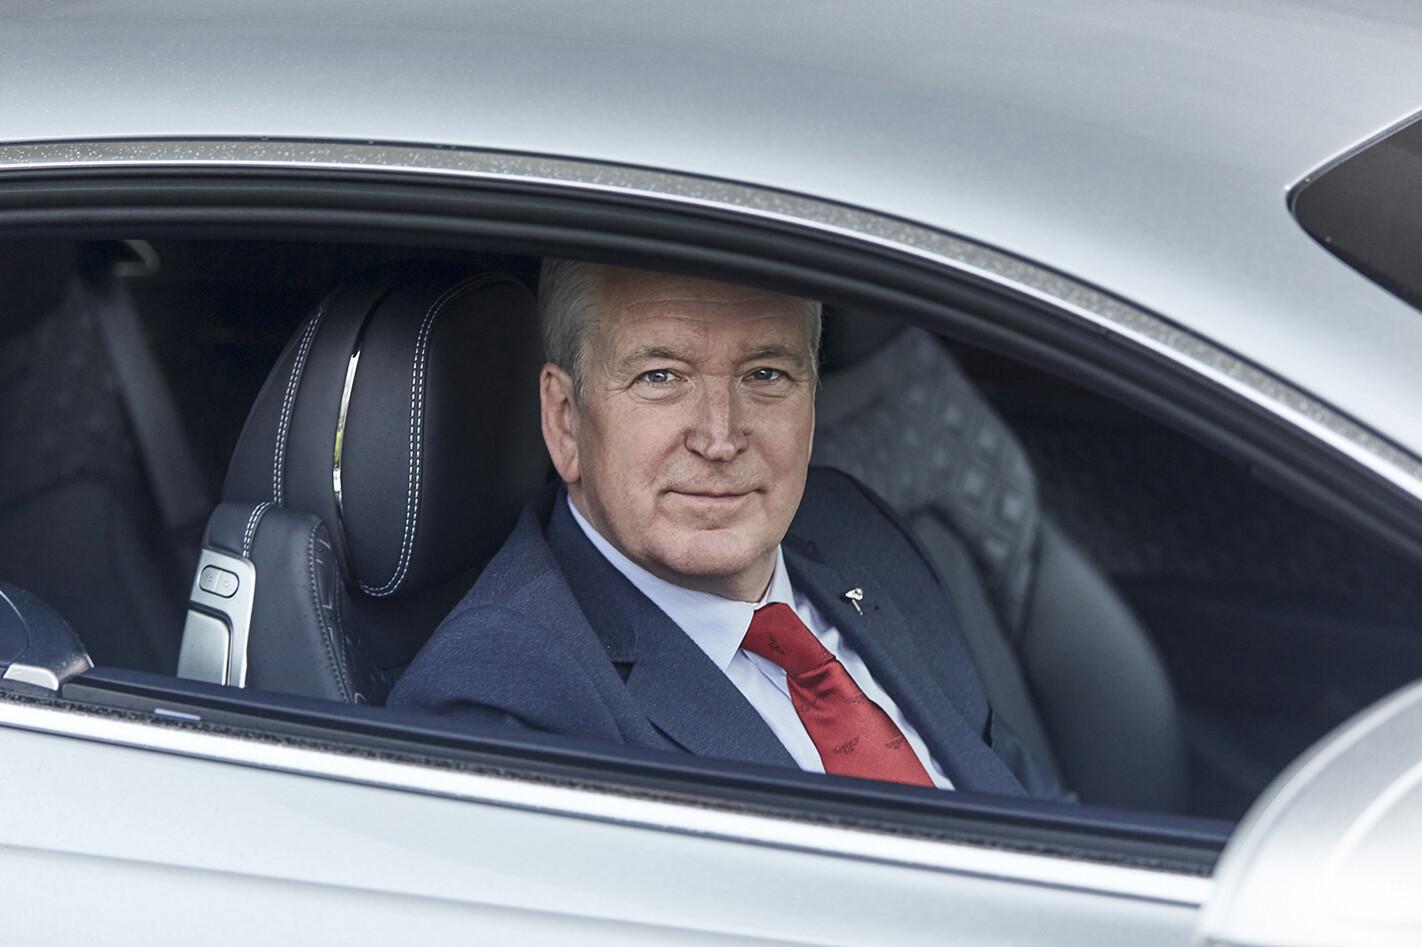 Bentley Chairman and CEO Adrian Hallmark